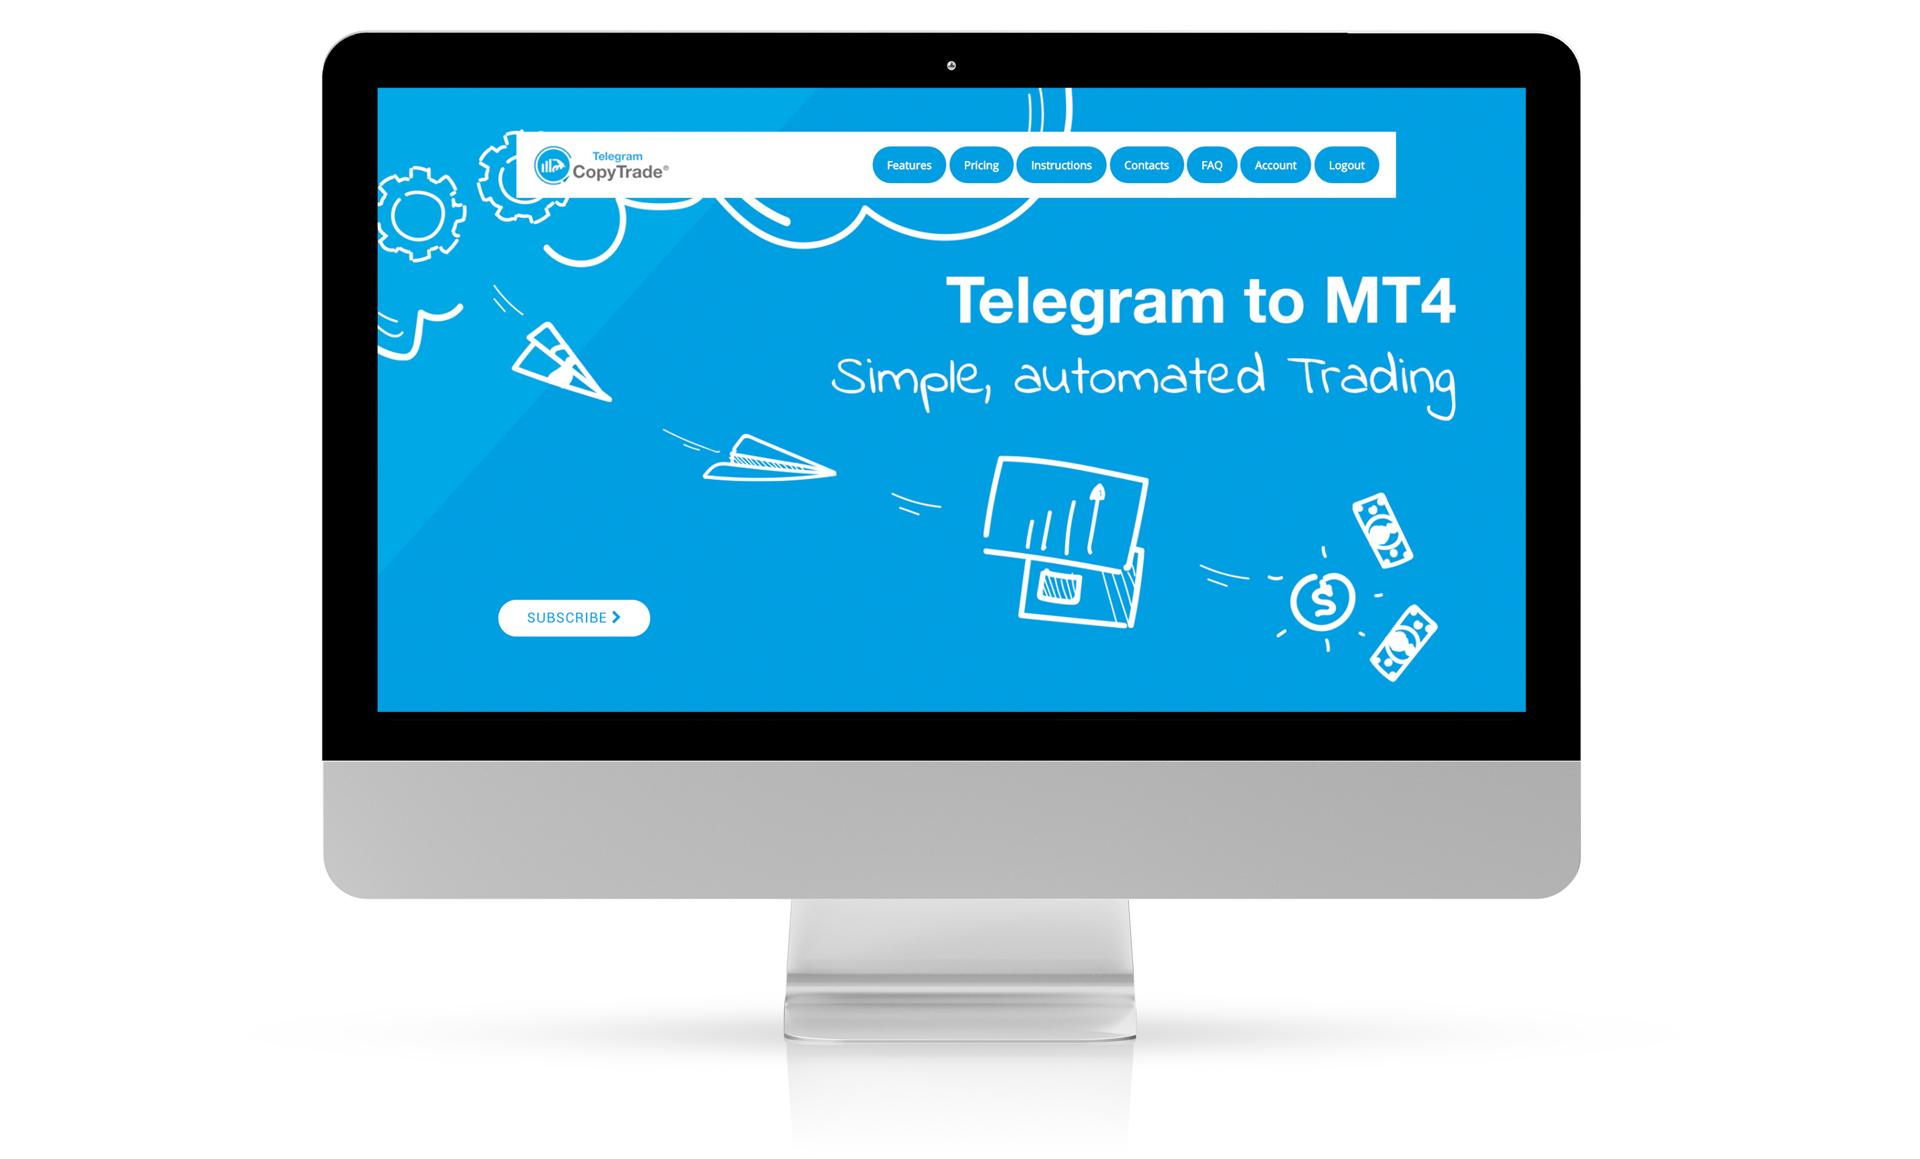 telegram copytrade